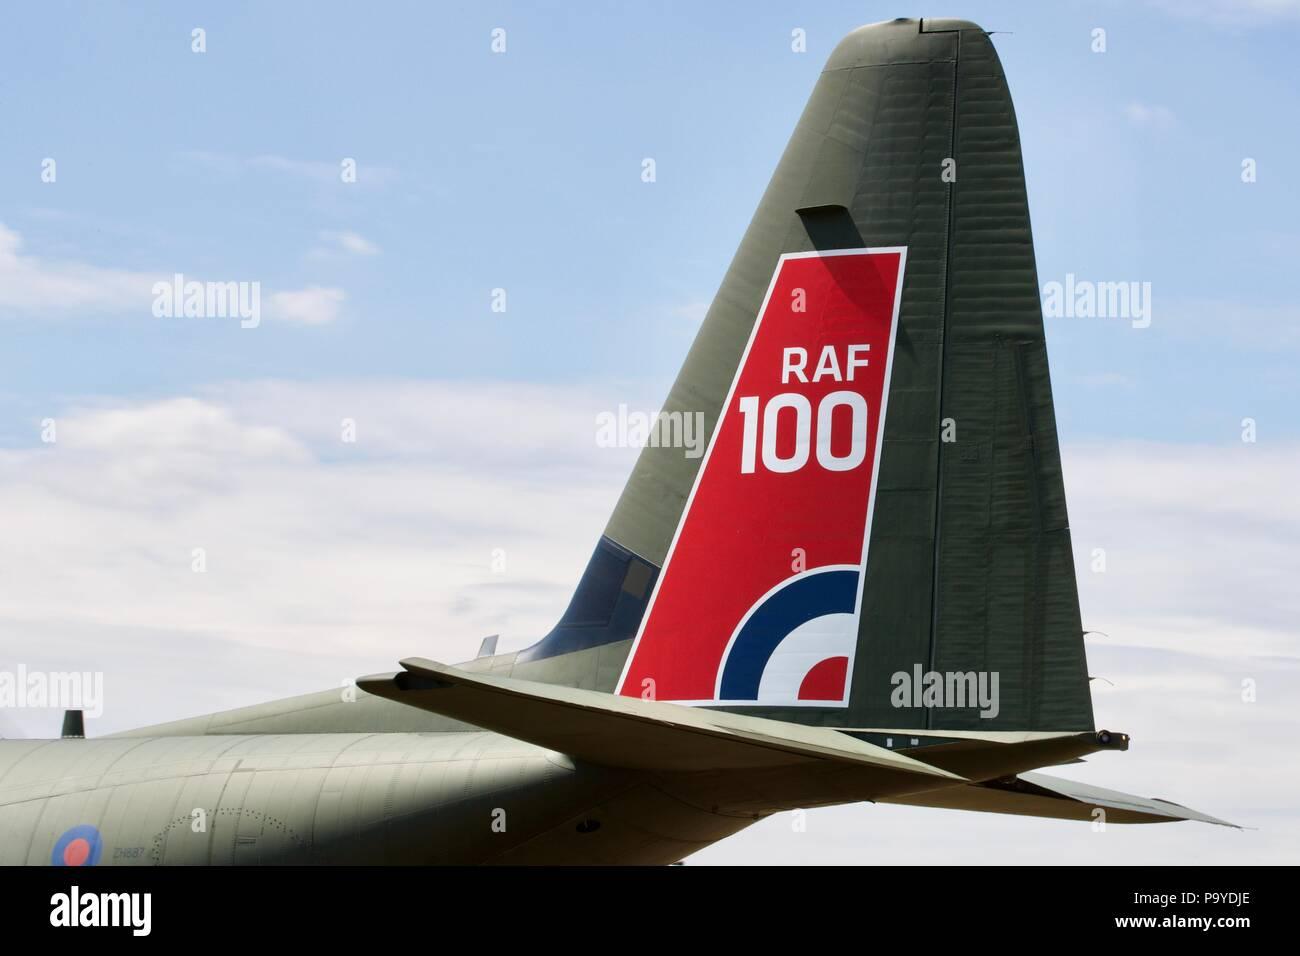 RAF100 Logo on a RAF Hercules vertical stabiliser and rudder at the 2018 Royal International Air Tattoo - Stock Image